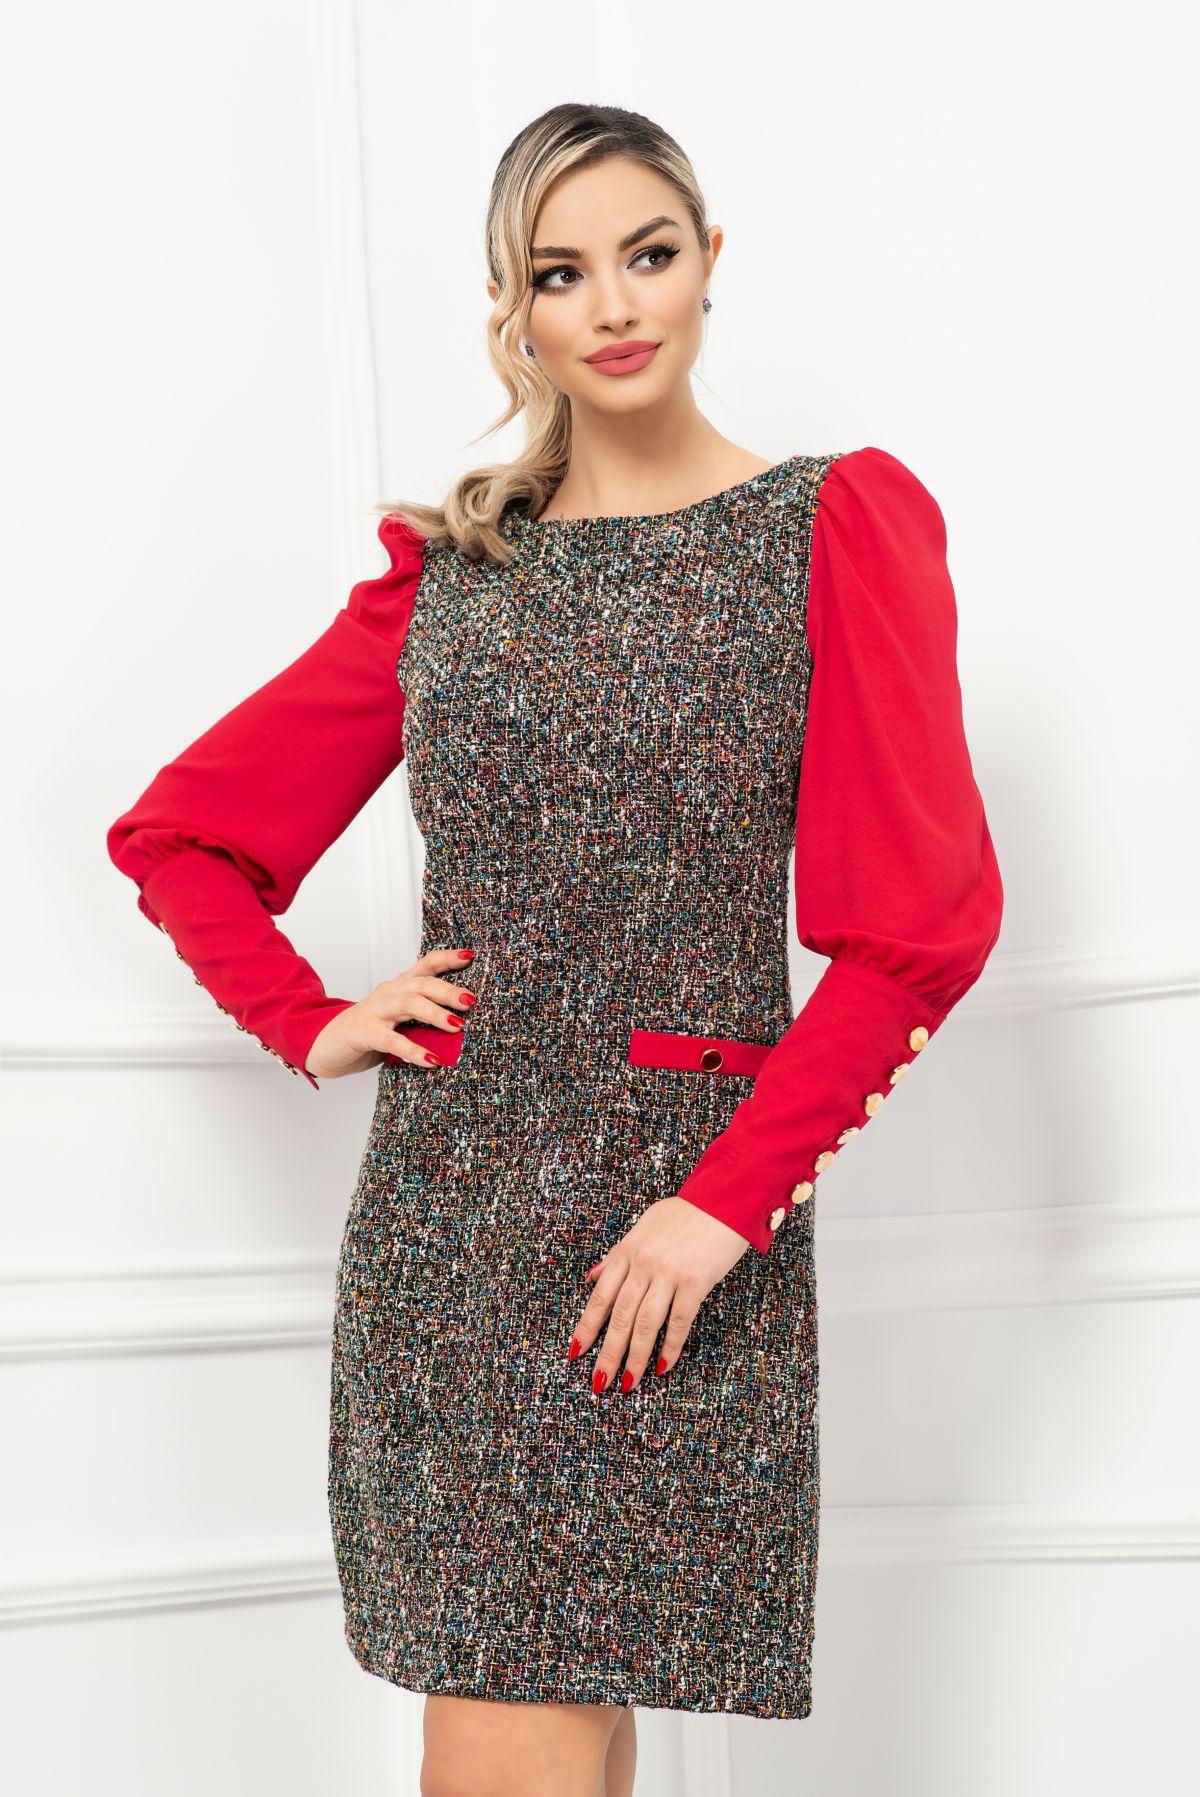 Rochie de zi din bucle multicolora cu maneci din voal si nasturi aurii MBG-Collection